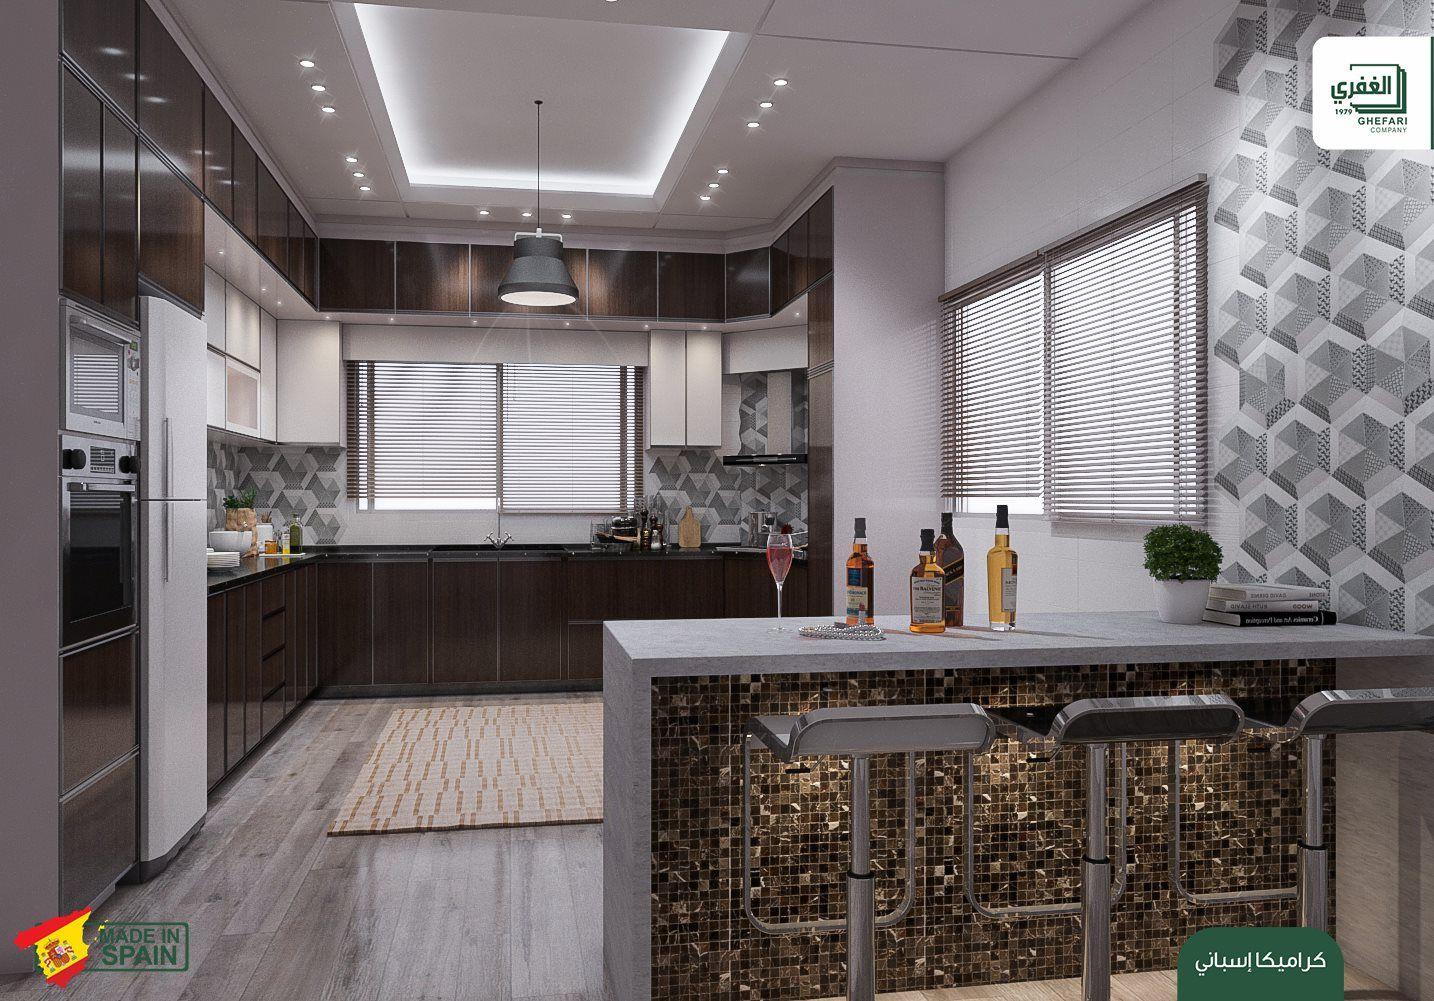 Pin By شركة الغفري للاستيراد والتسويق On مطبخ عصري Kitchen Home Decor Home